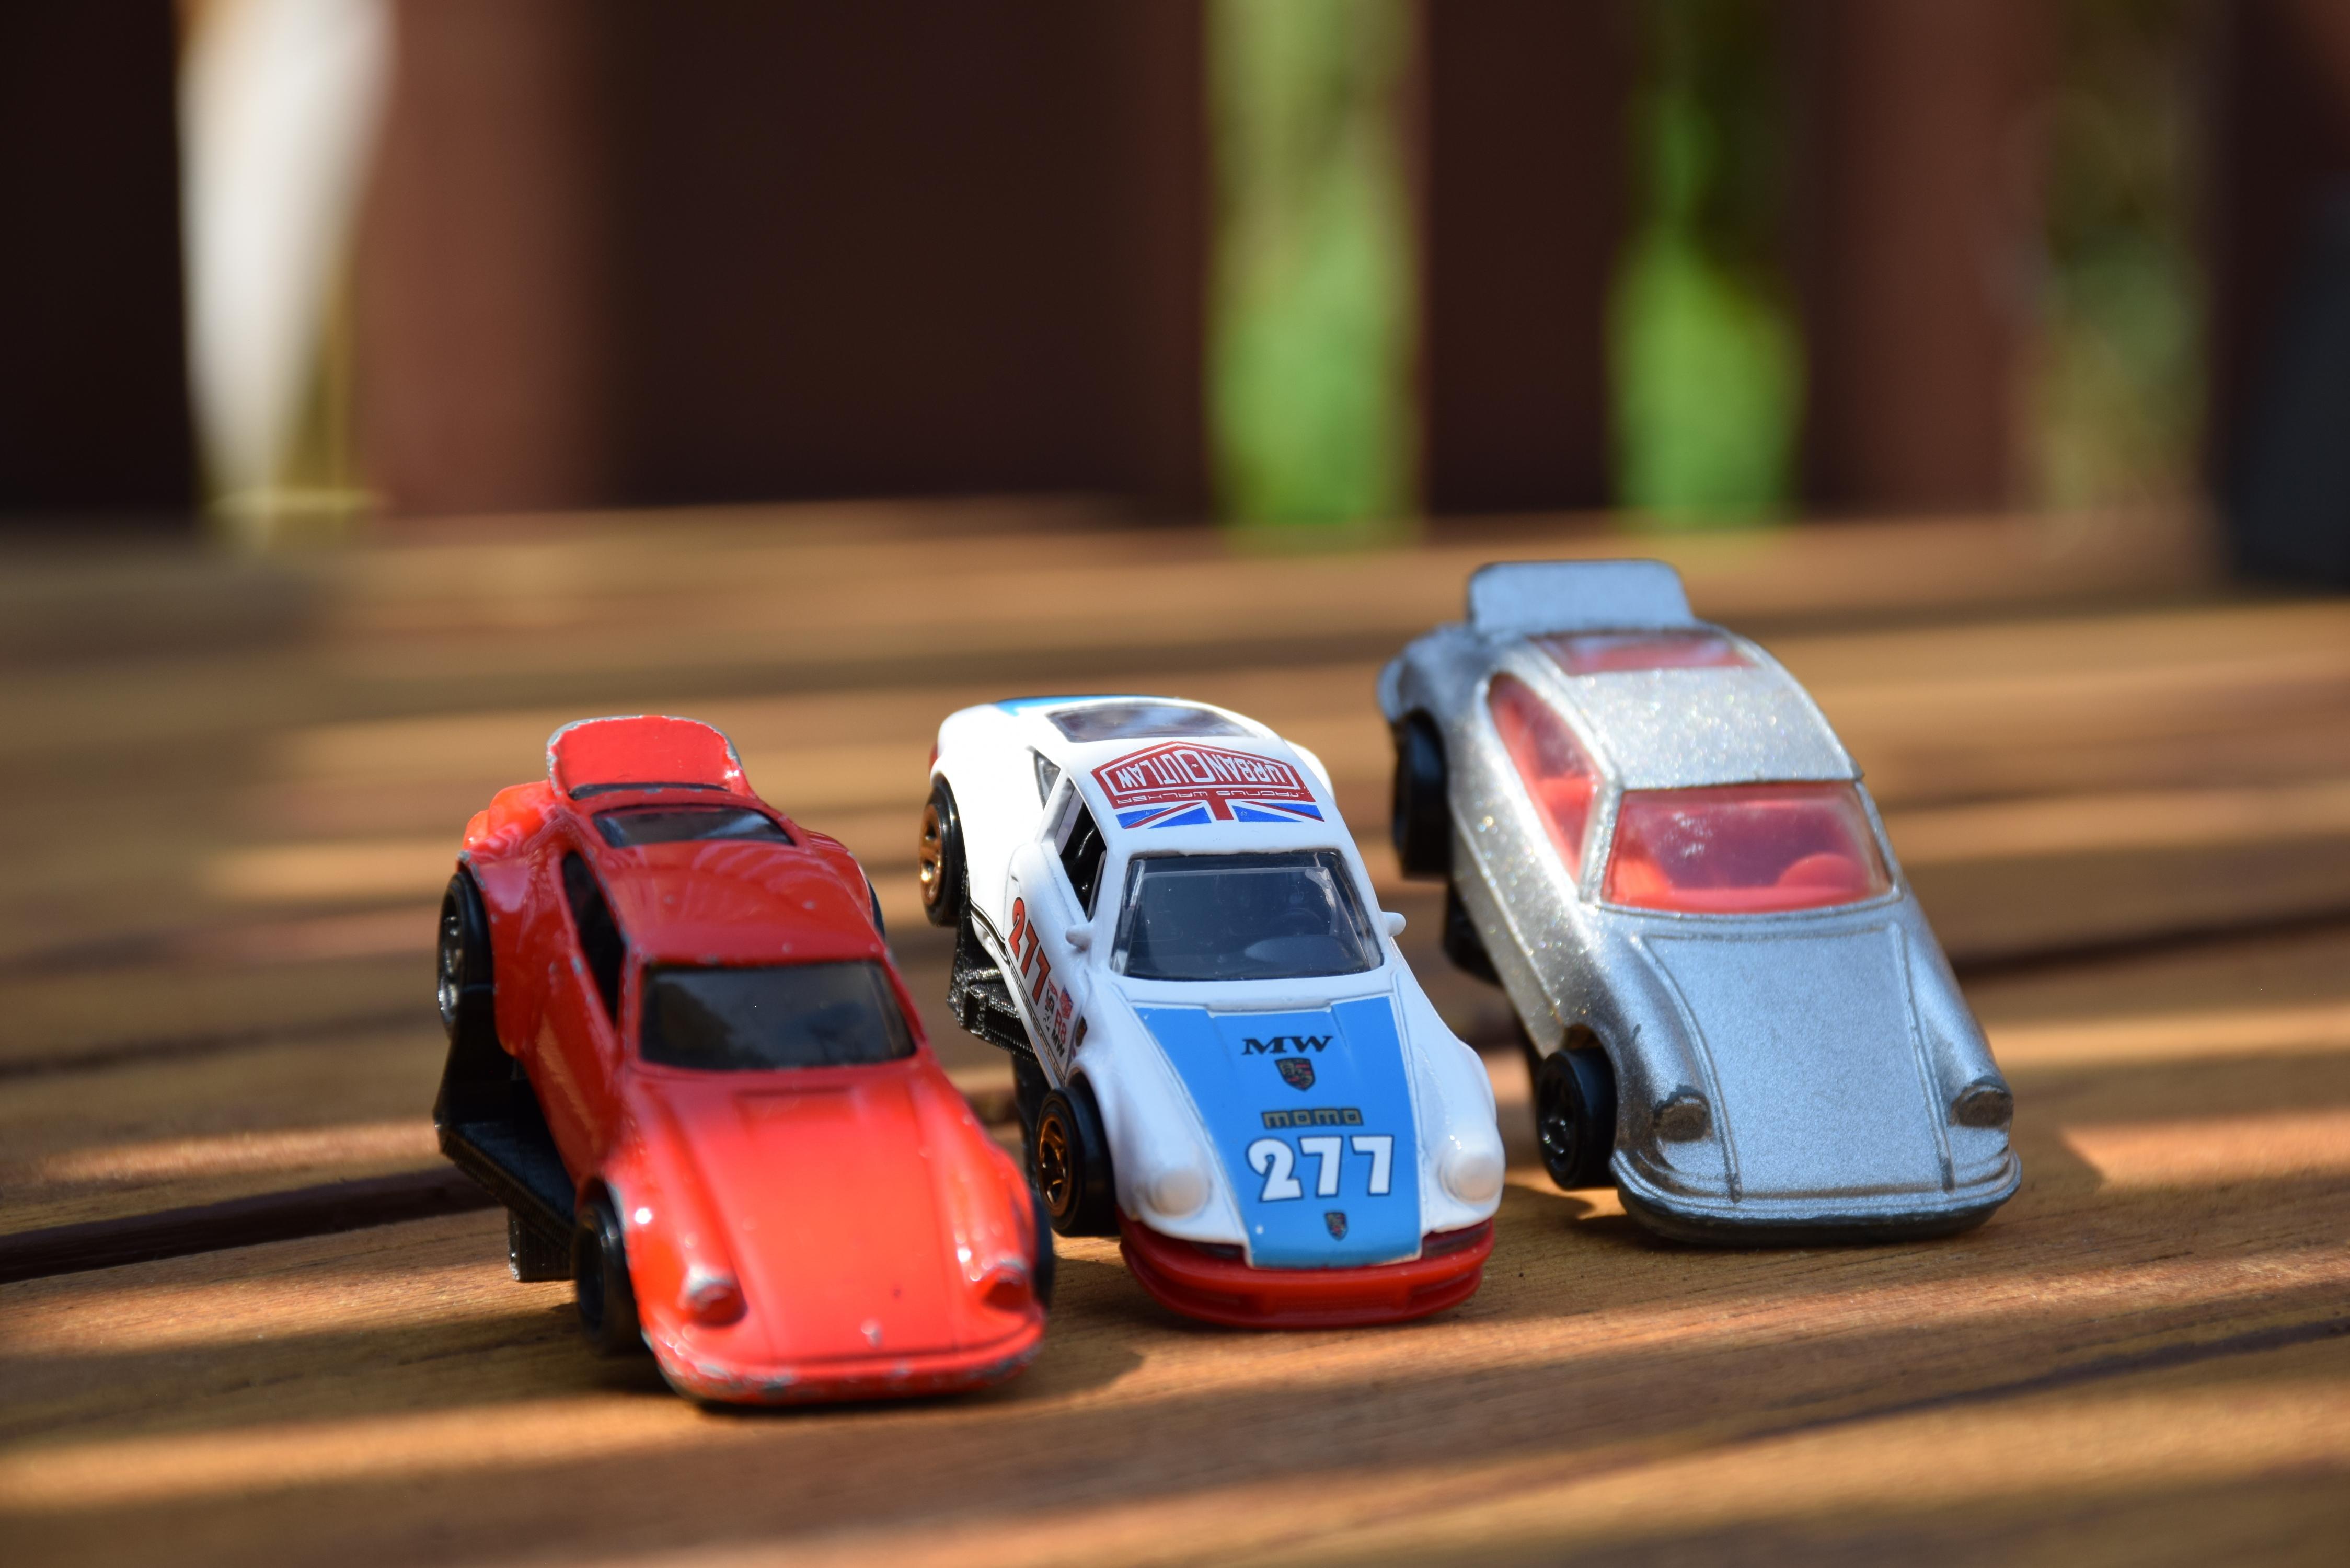 DSC_0495.JPG Download STL file Hotwheels & Diecast Car Display Mount • 3D printer model, mistry3design